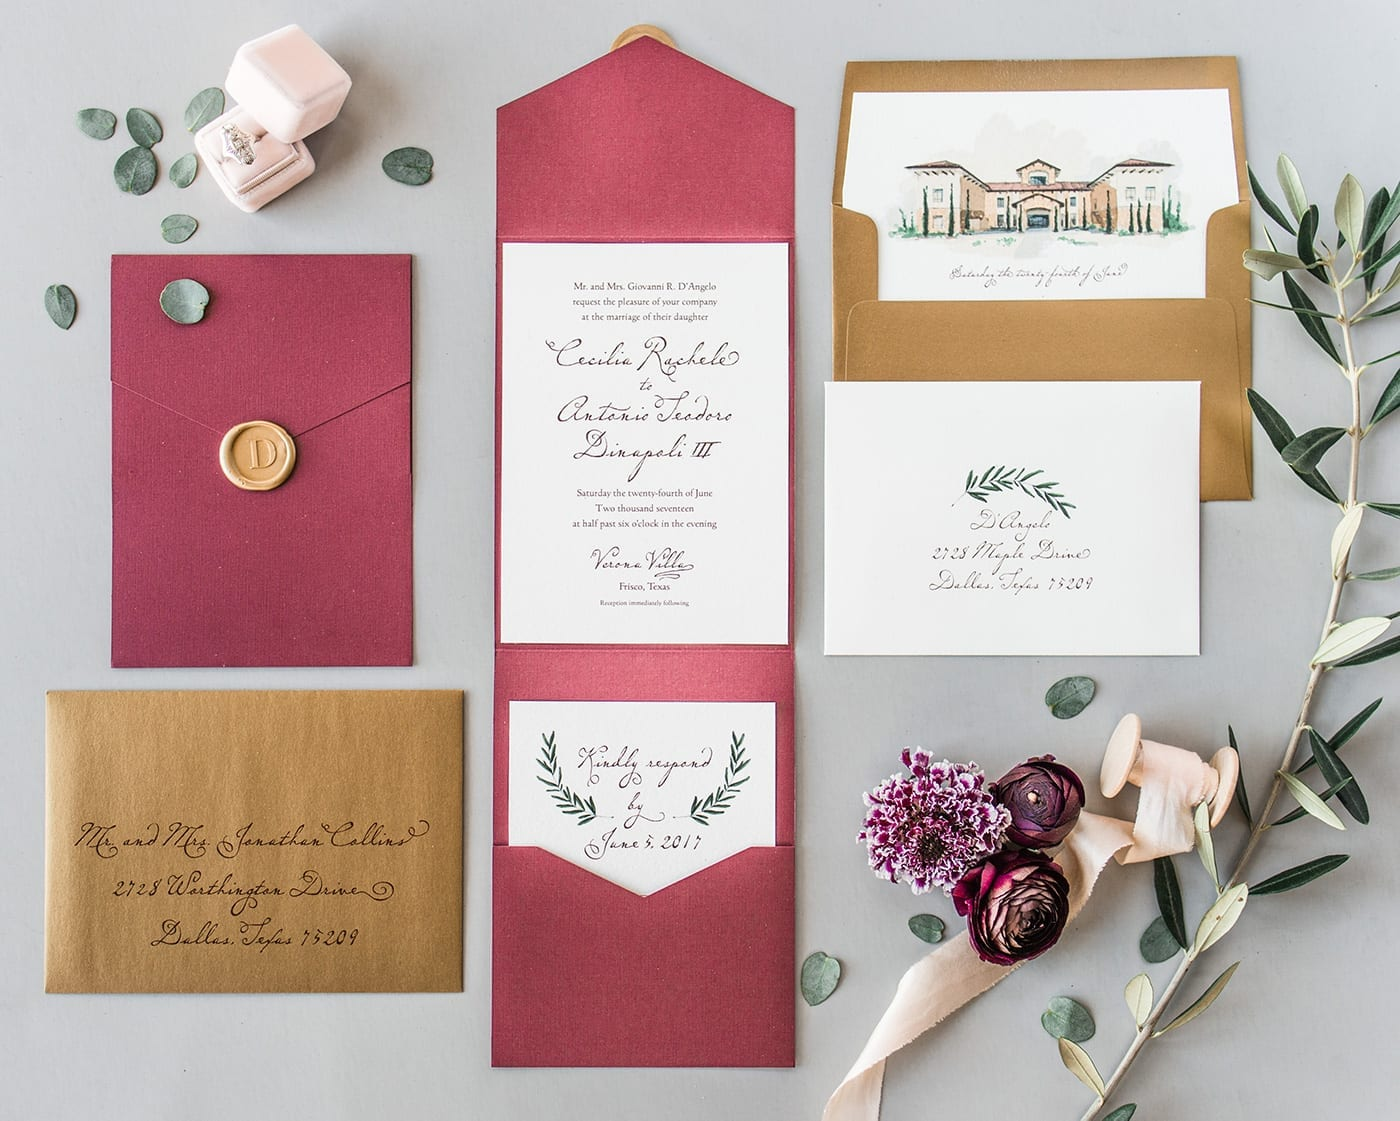 Illustrated creative wedding invitations illustratedweddings elegant hand drawn illustrations for luxurious weddings monicamarmolfo Image collections